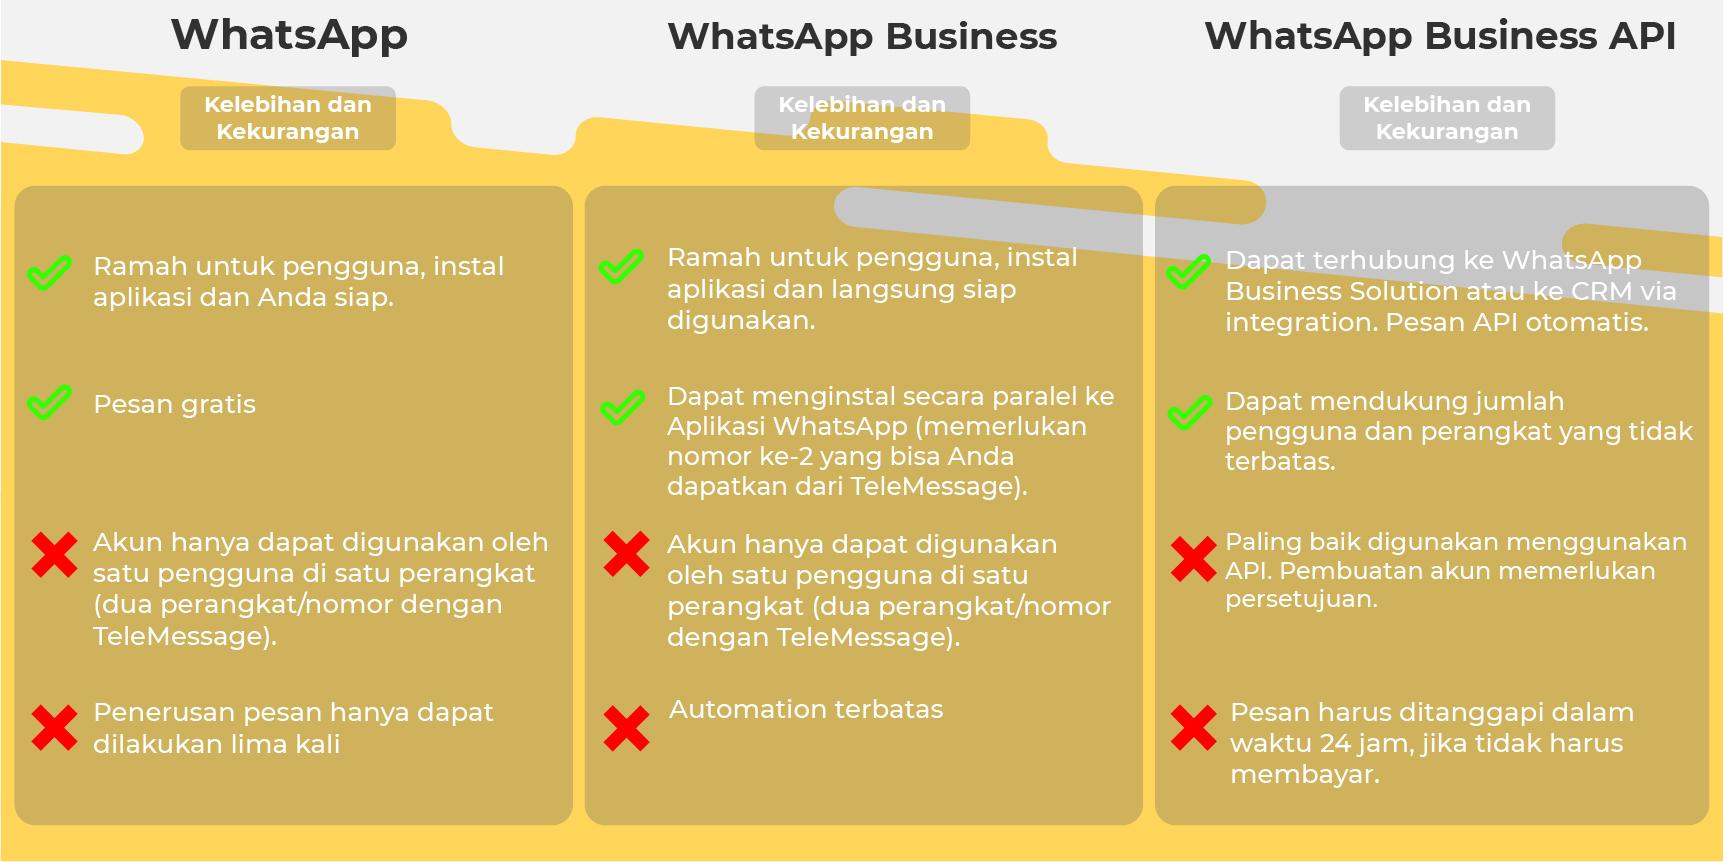 (perbedaan antara WhatsApp, WhatsApp Business, dan WhatsApp Business API)